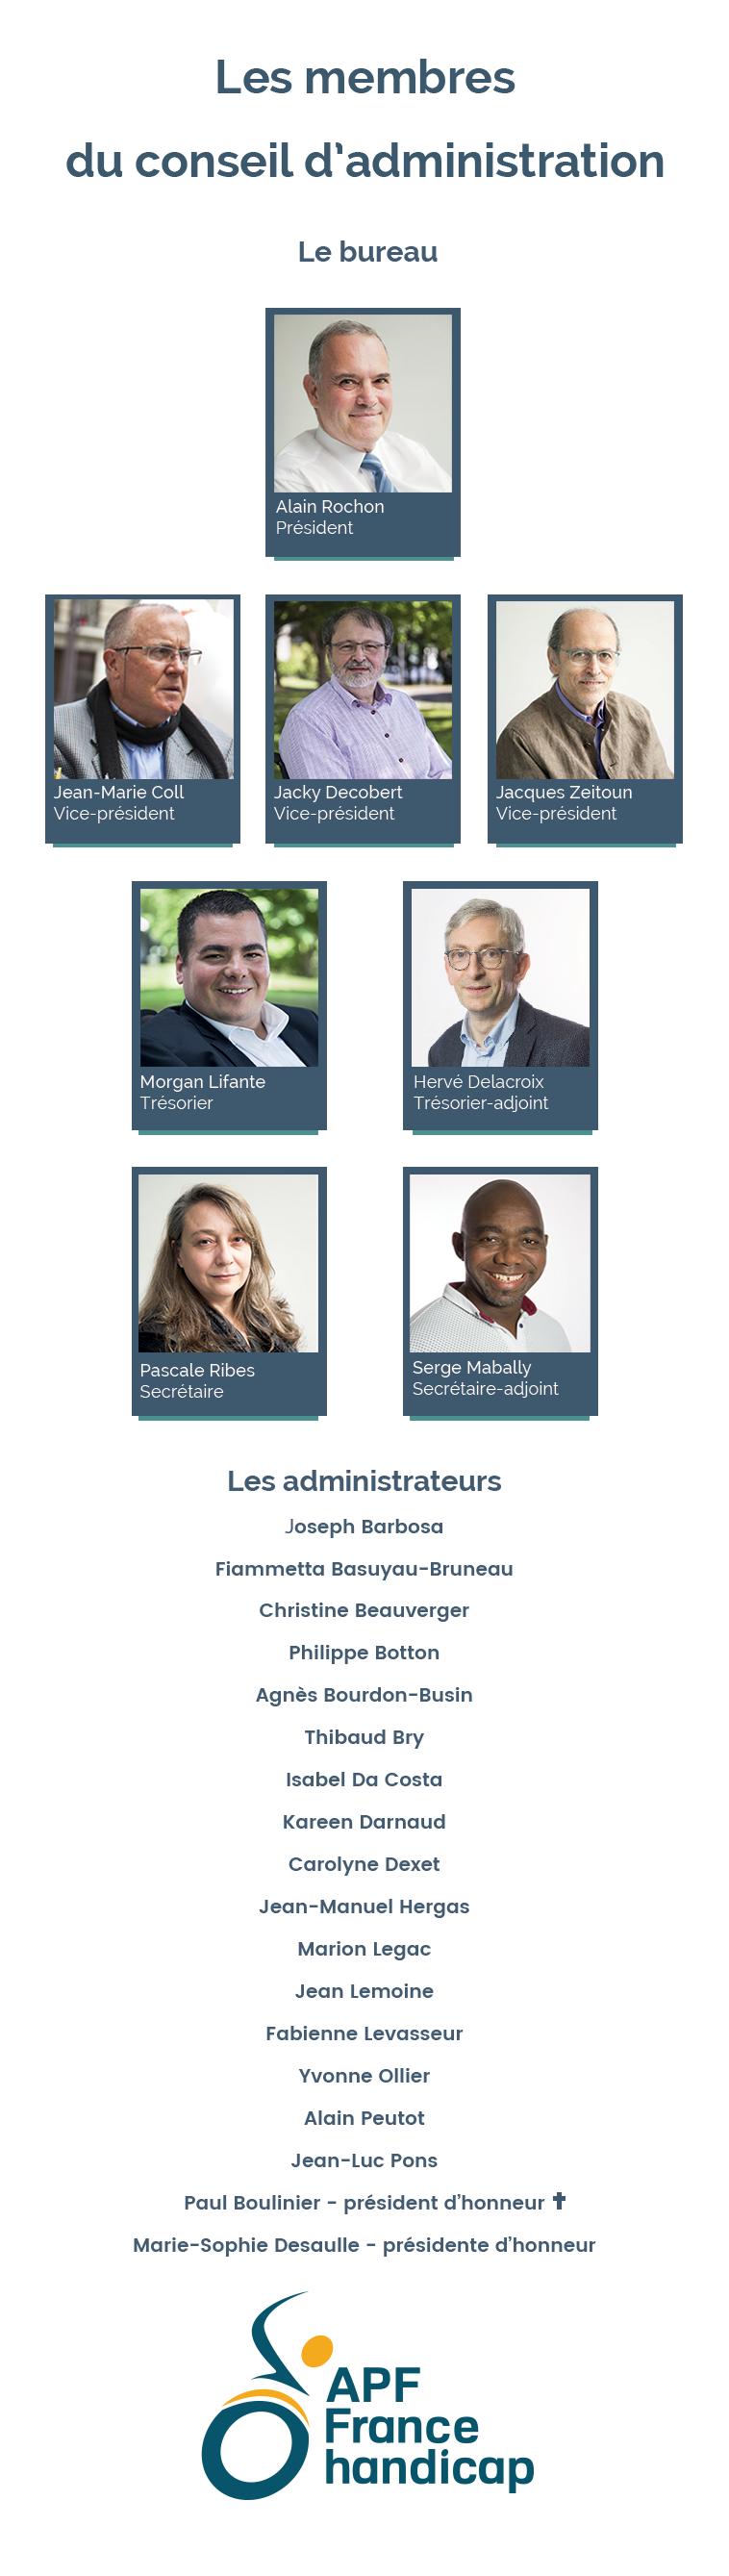 organigramme du conseil d'administration d'APF France handicap